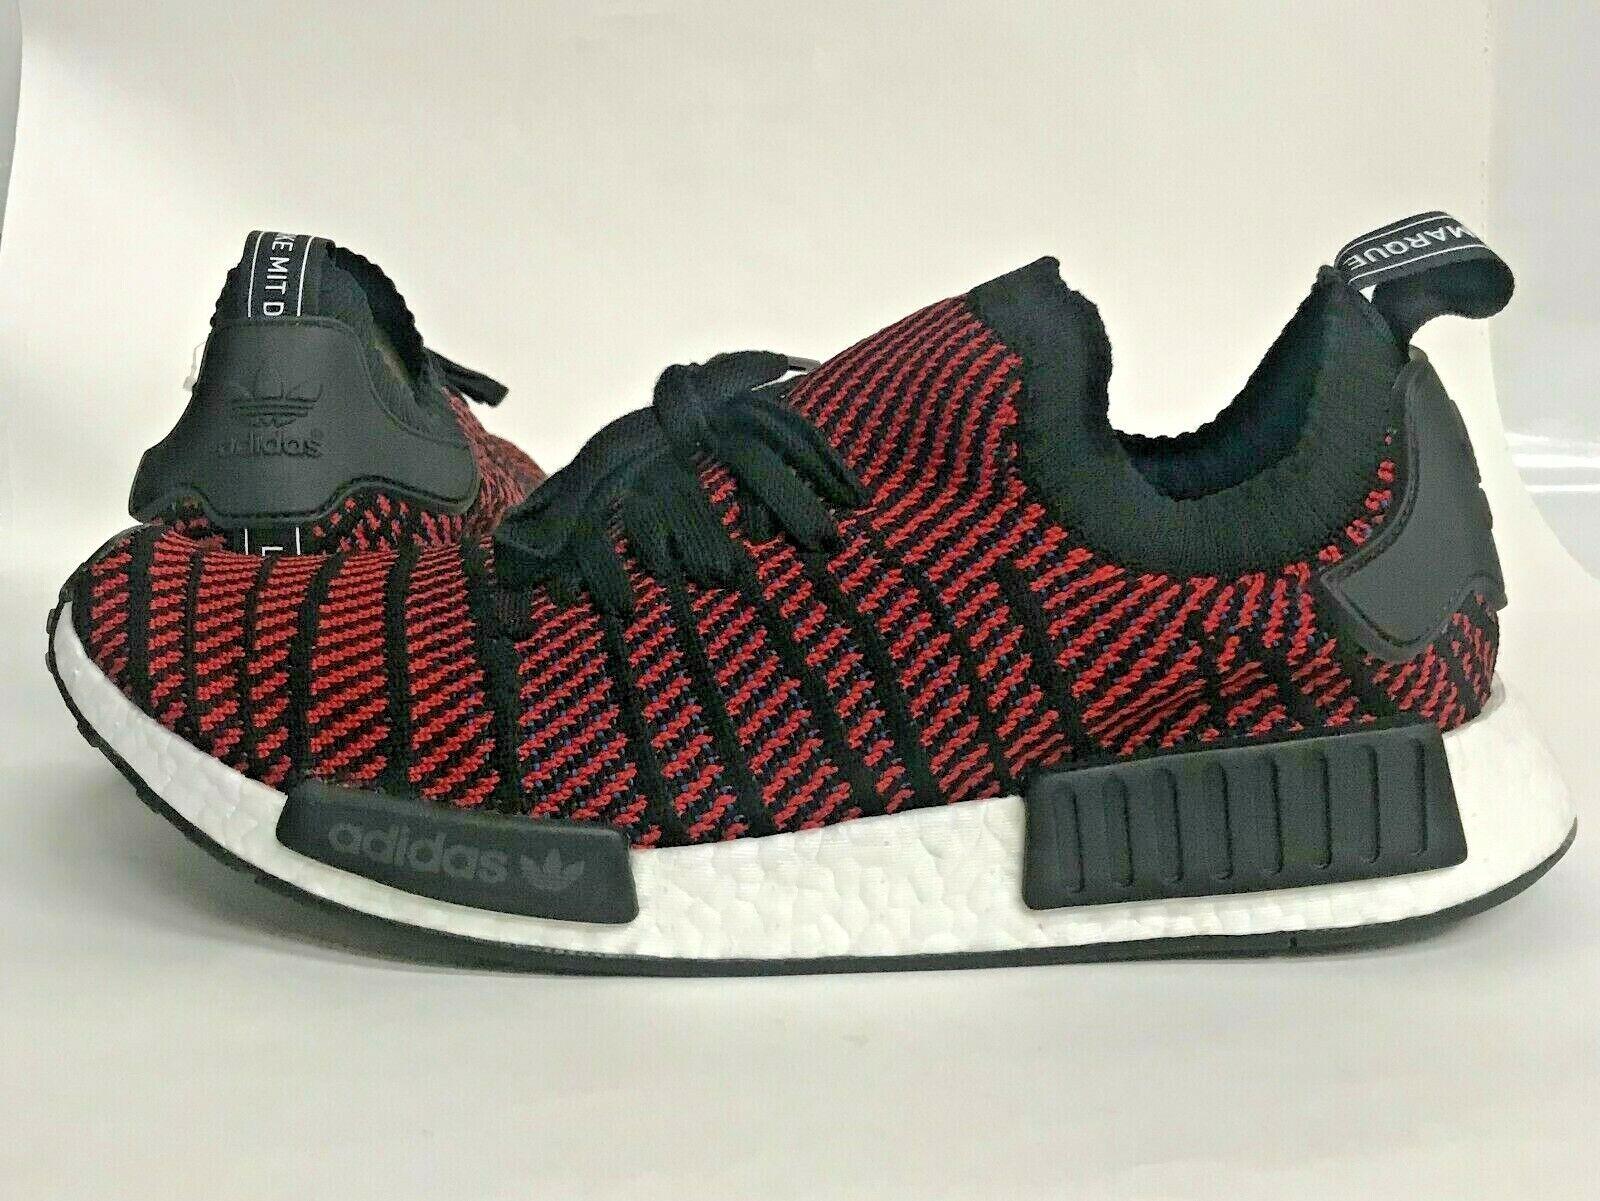 NIB Men's size 13 adidas NMD PRIMEKNIT running Sneakers black red cq2385